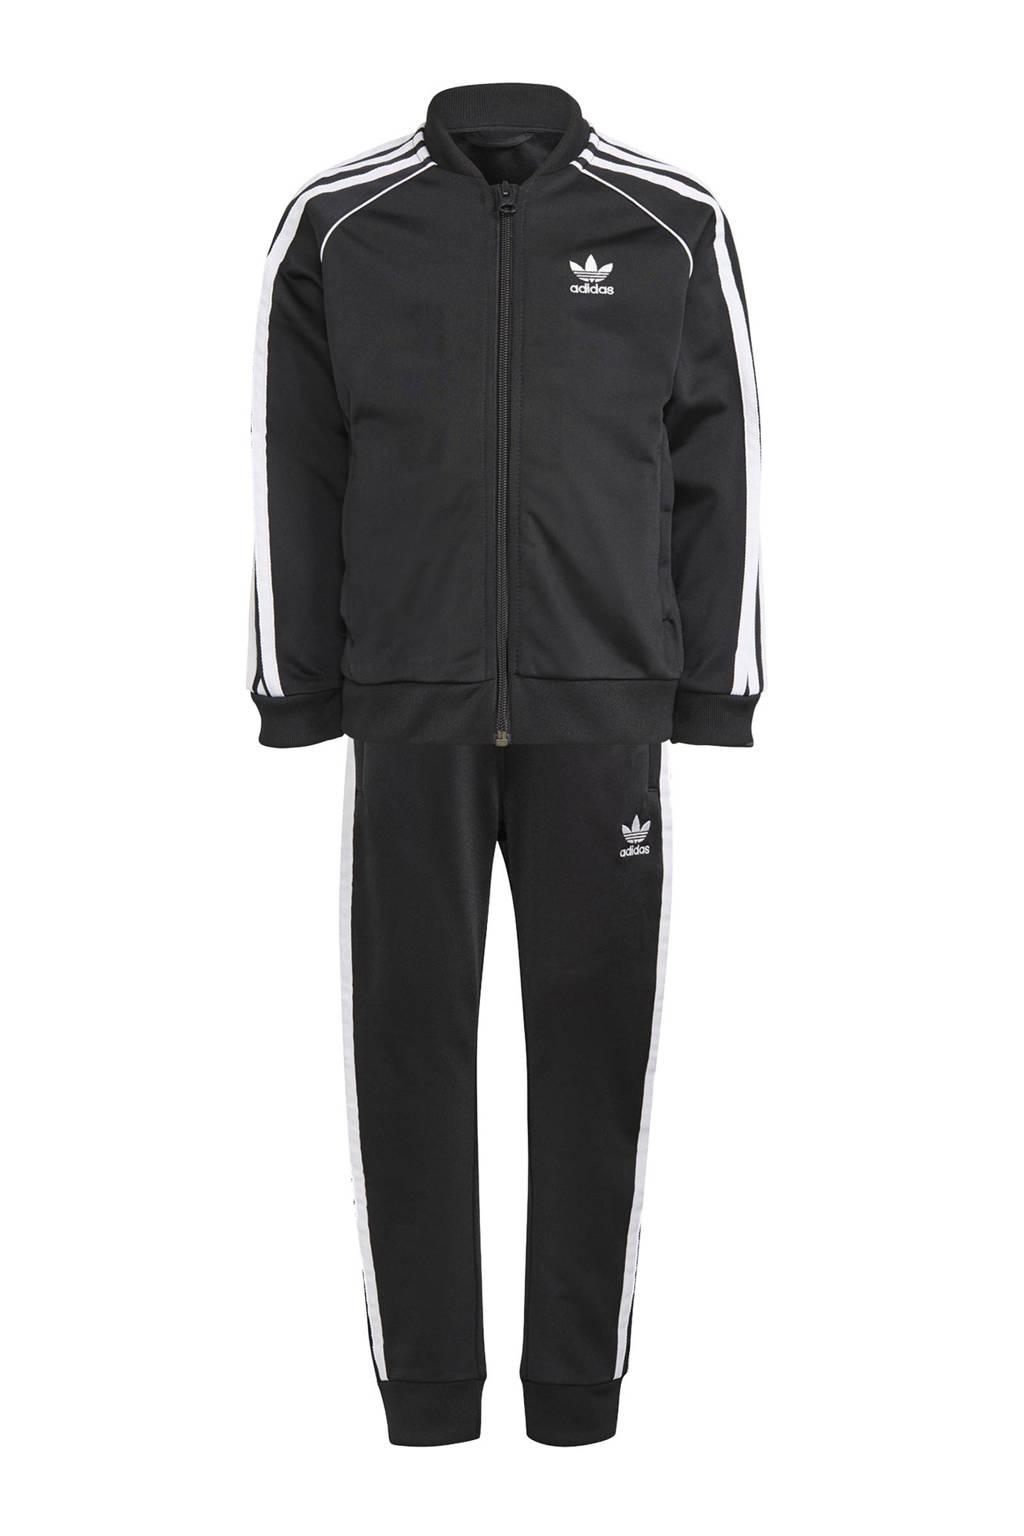 adidas Originals   Superstar Adicolor trainingspak zwart/wit, Zwart/wit